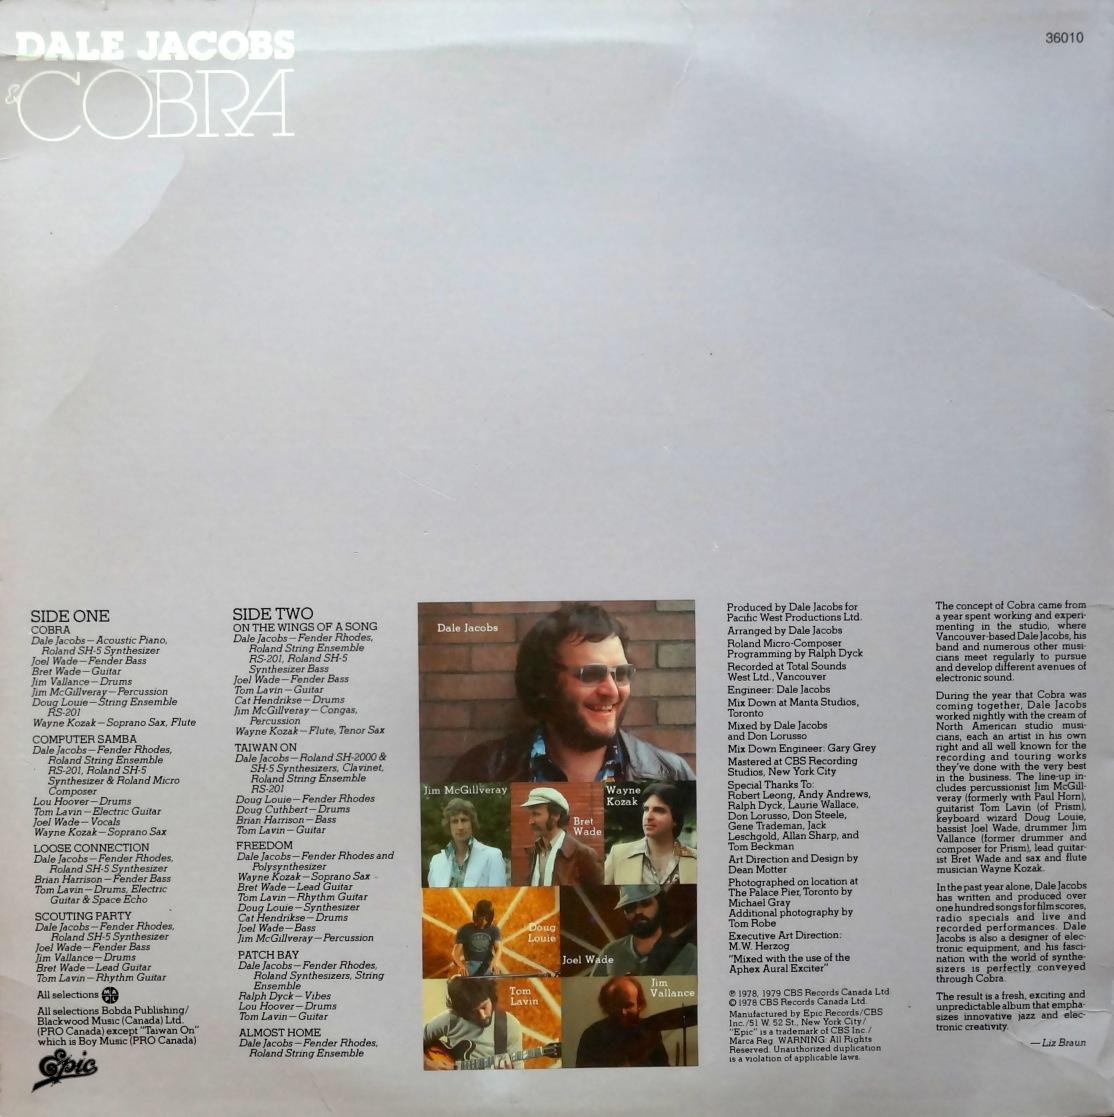 Dale Jacobs & Cobra Back